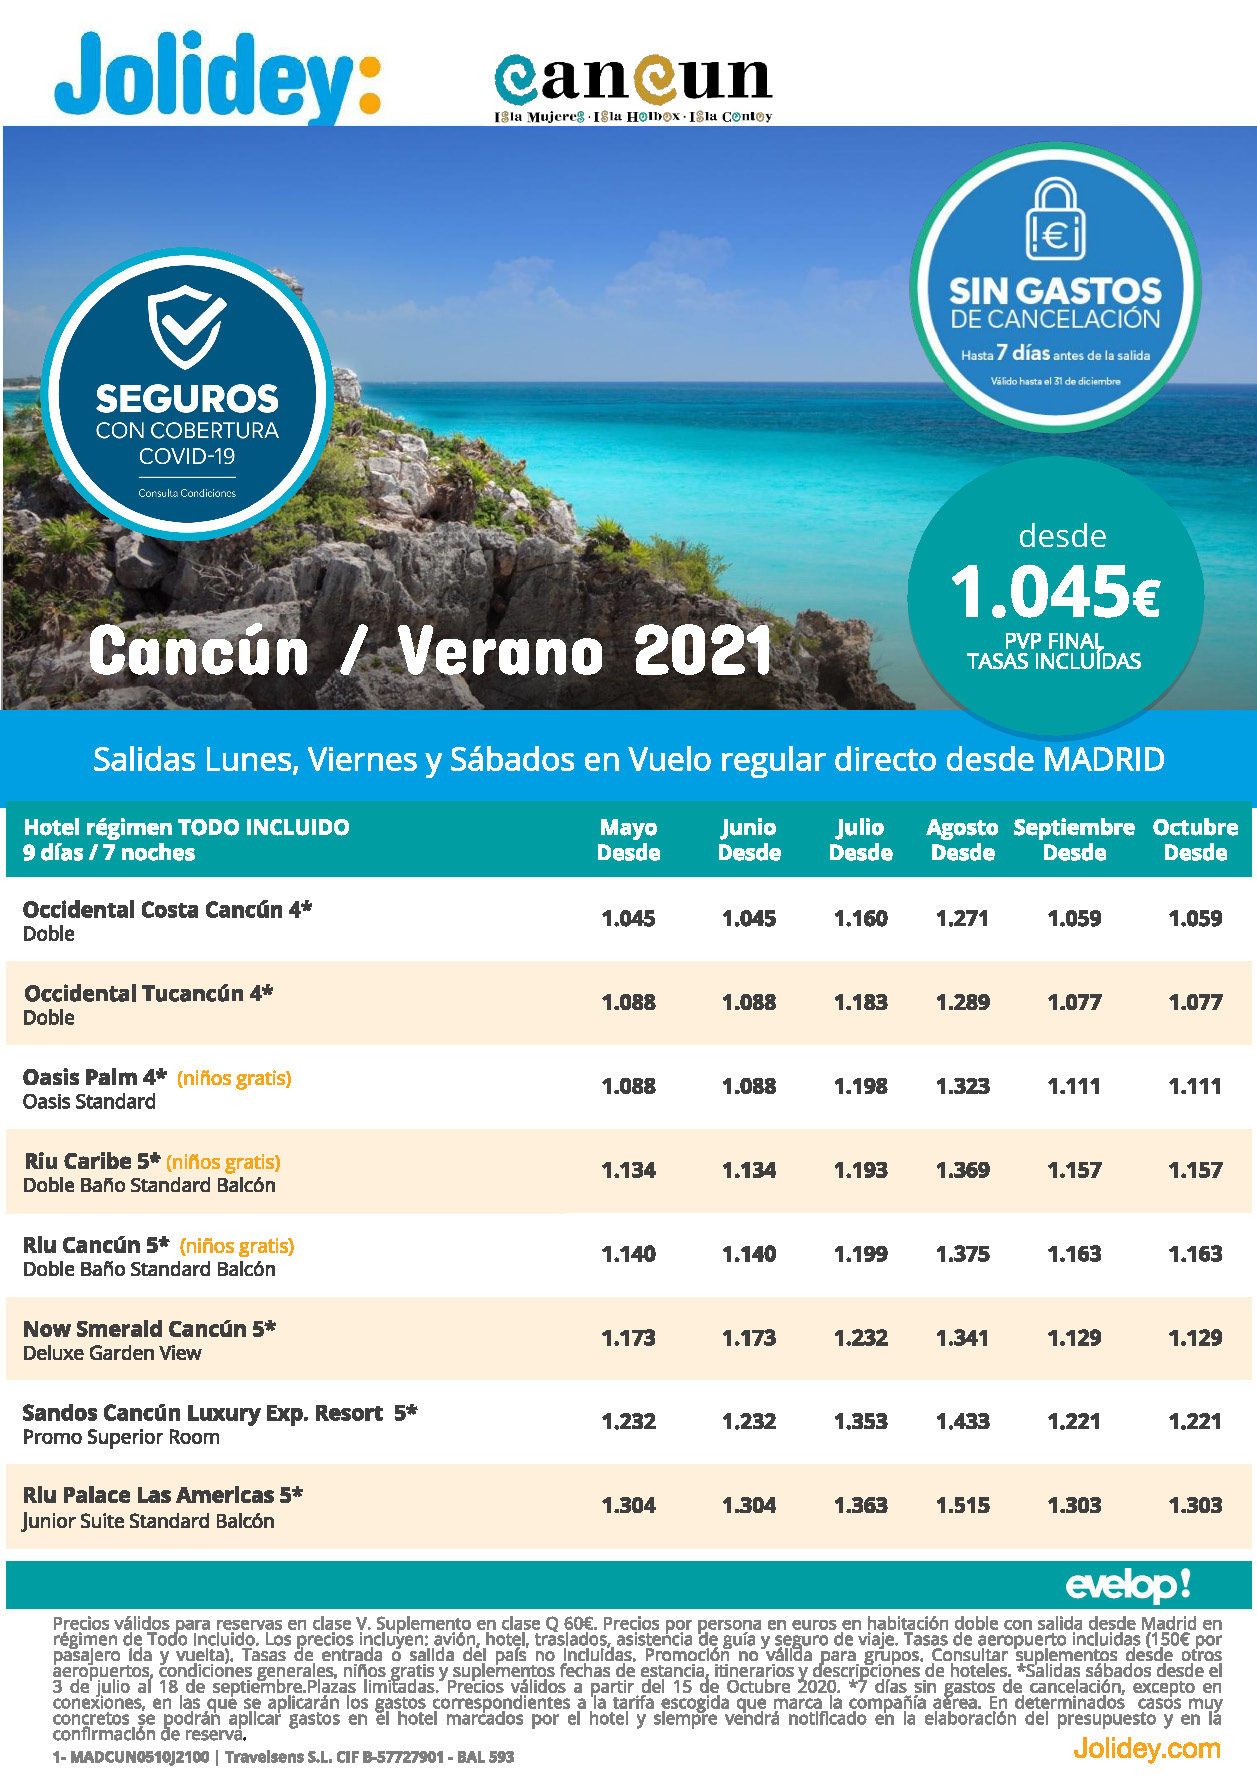 Oferta Jolidey Cancun Mexico Verano 2021 vuelo directo desde Madrid